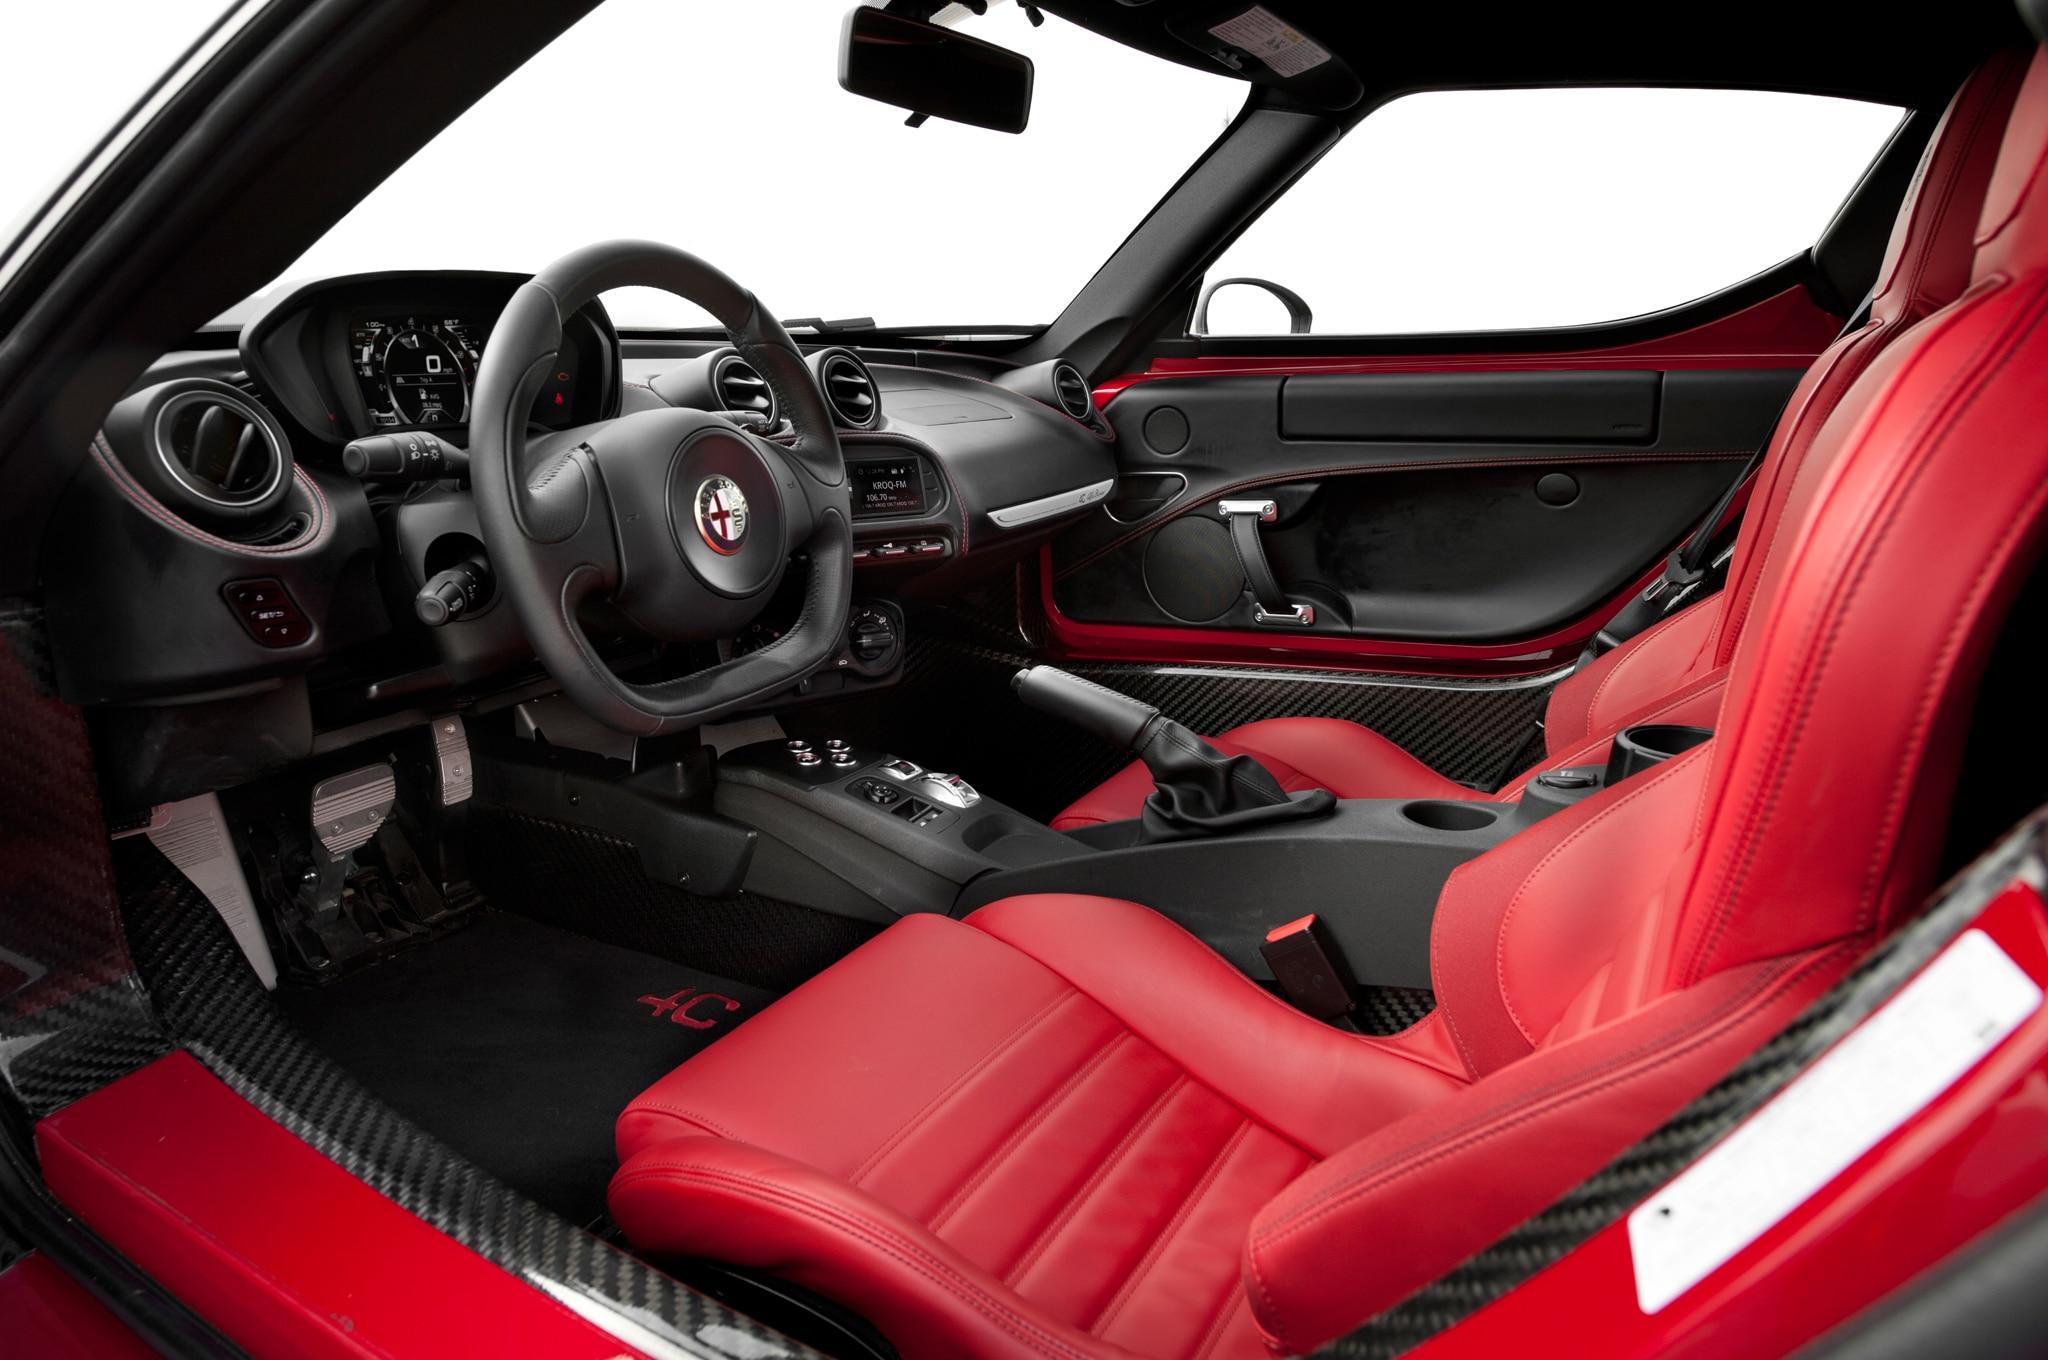 Alfa Romeo C Cockpit on Alfa Romeo Spider Transmission Mount